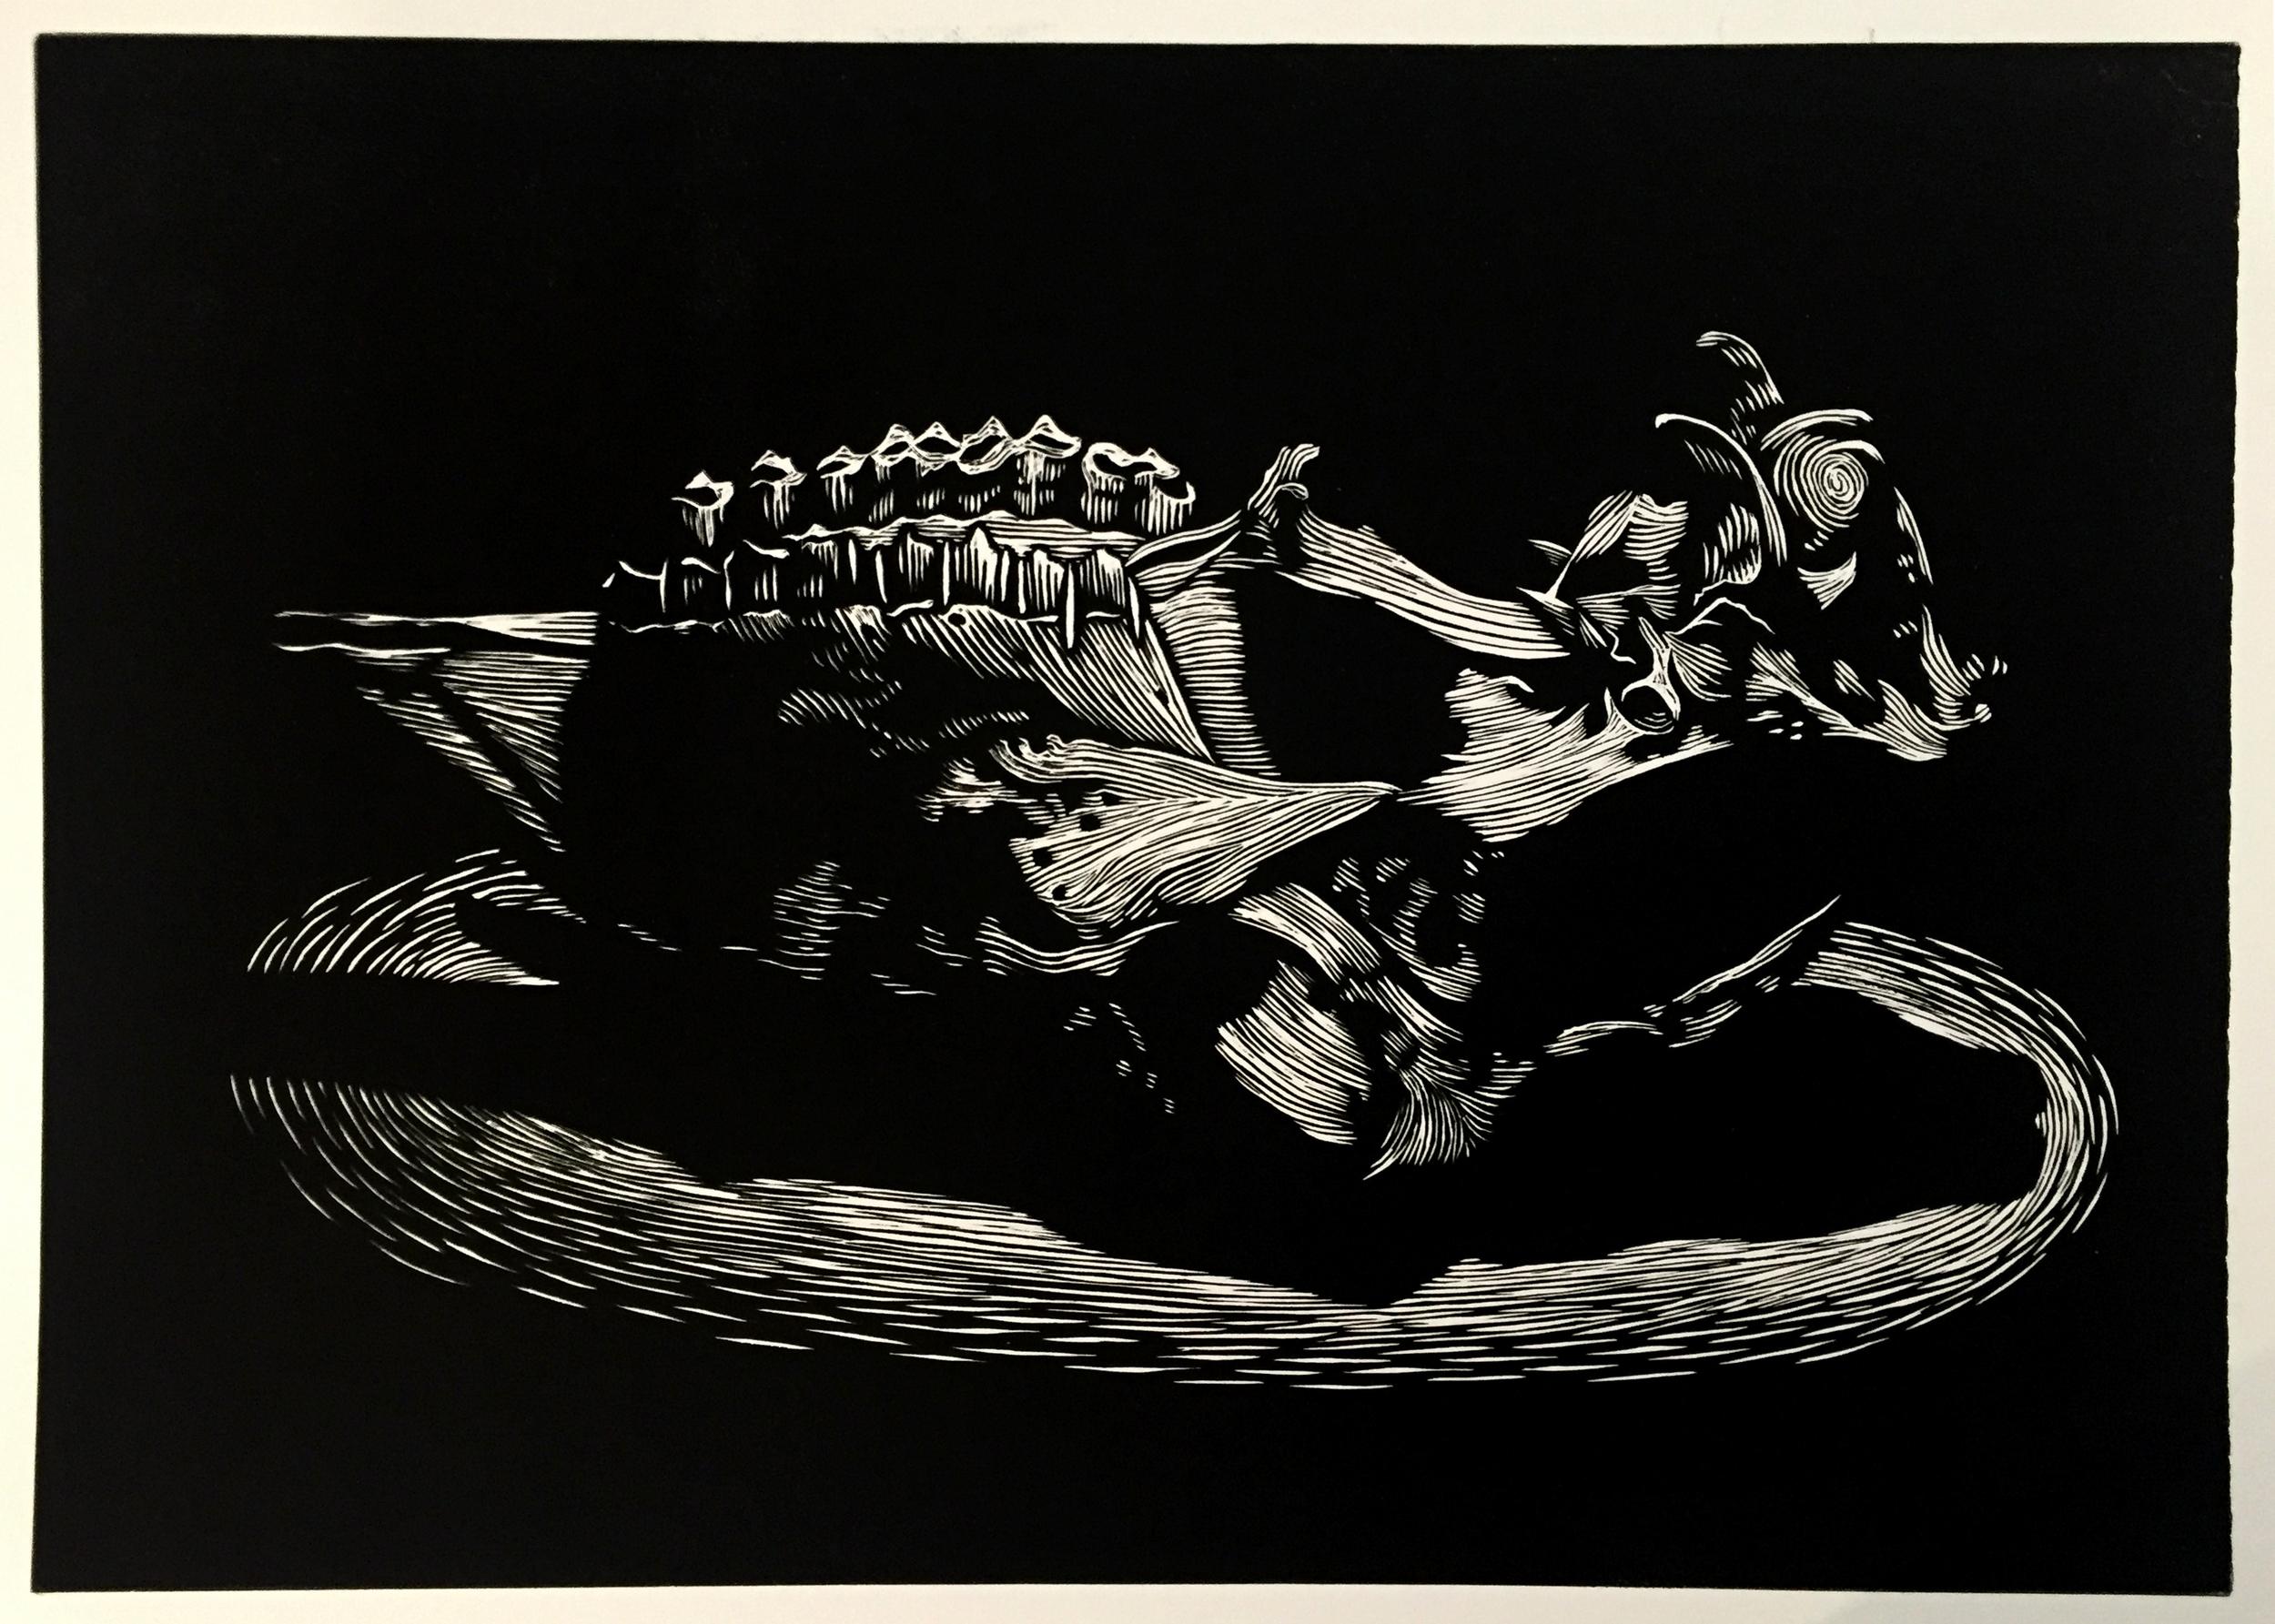 Lino Print on Paper (56x76cm)